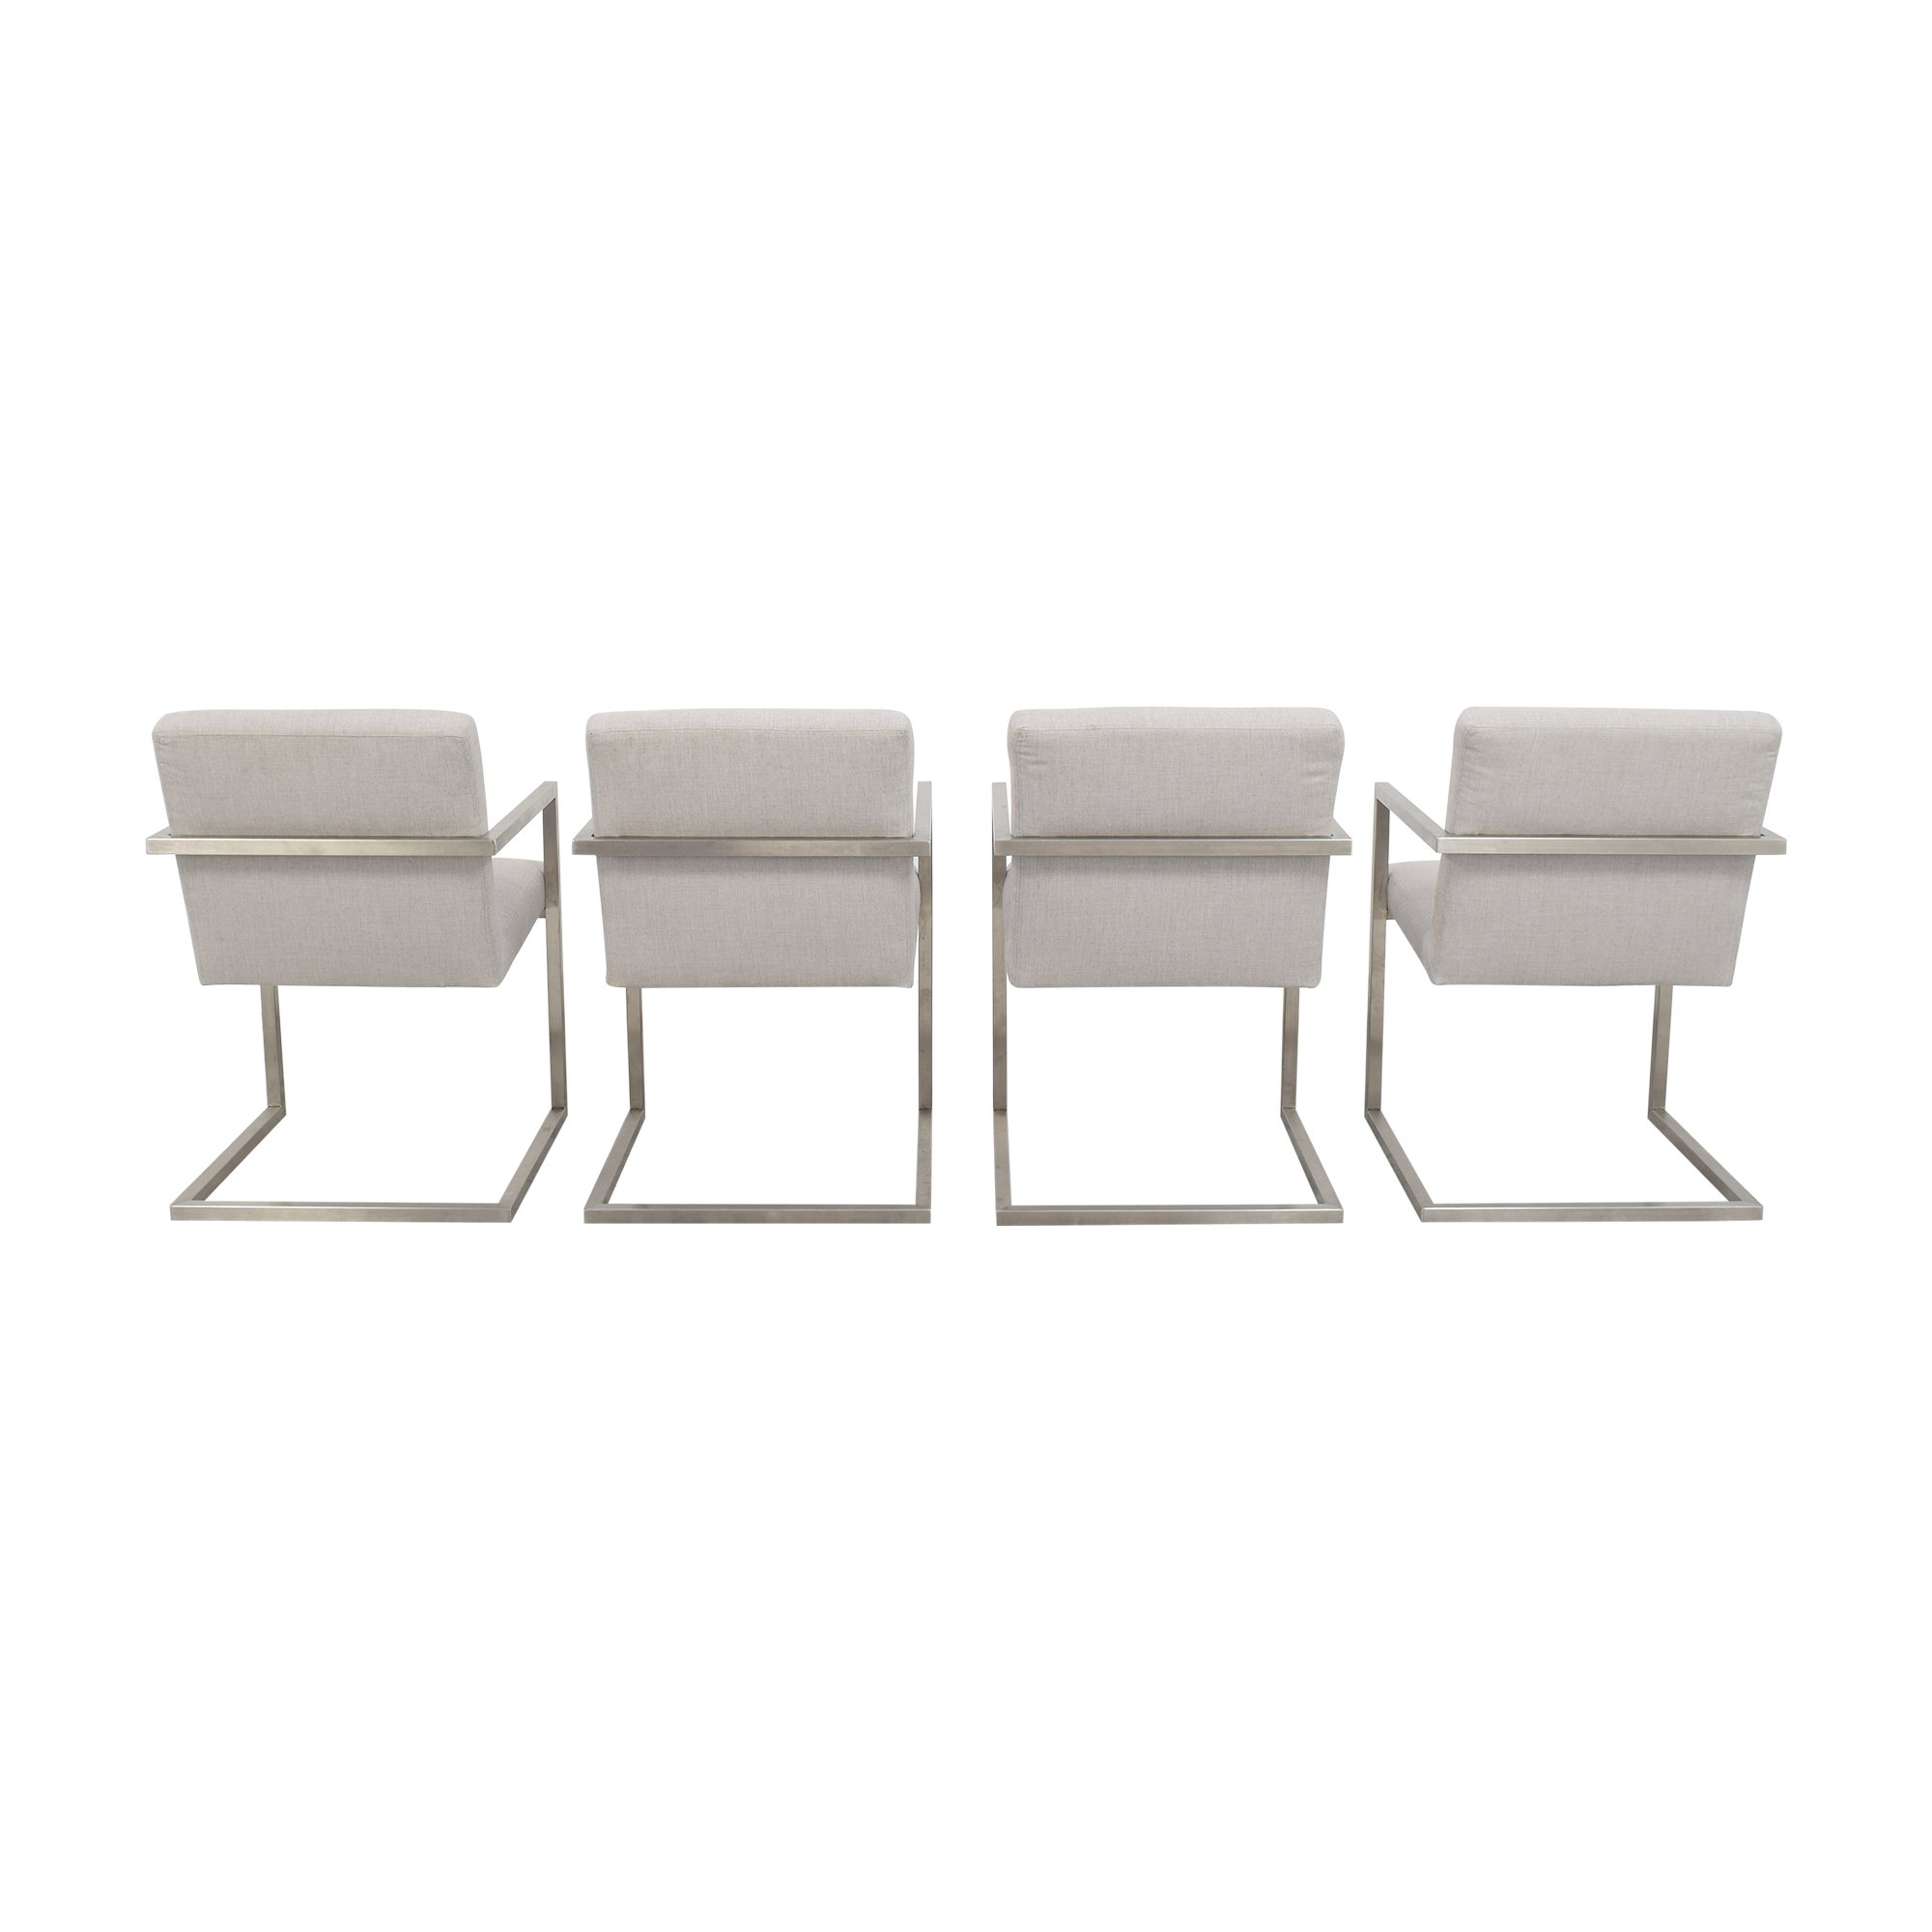 buy Room & Board Lira Dining Arm Chairs Room & Board Chairs